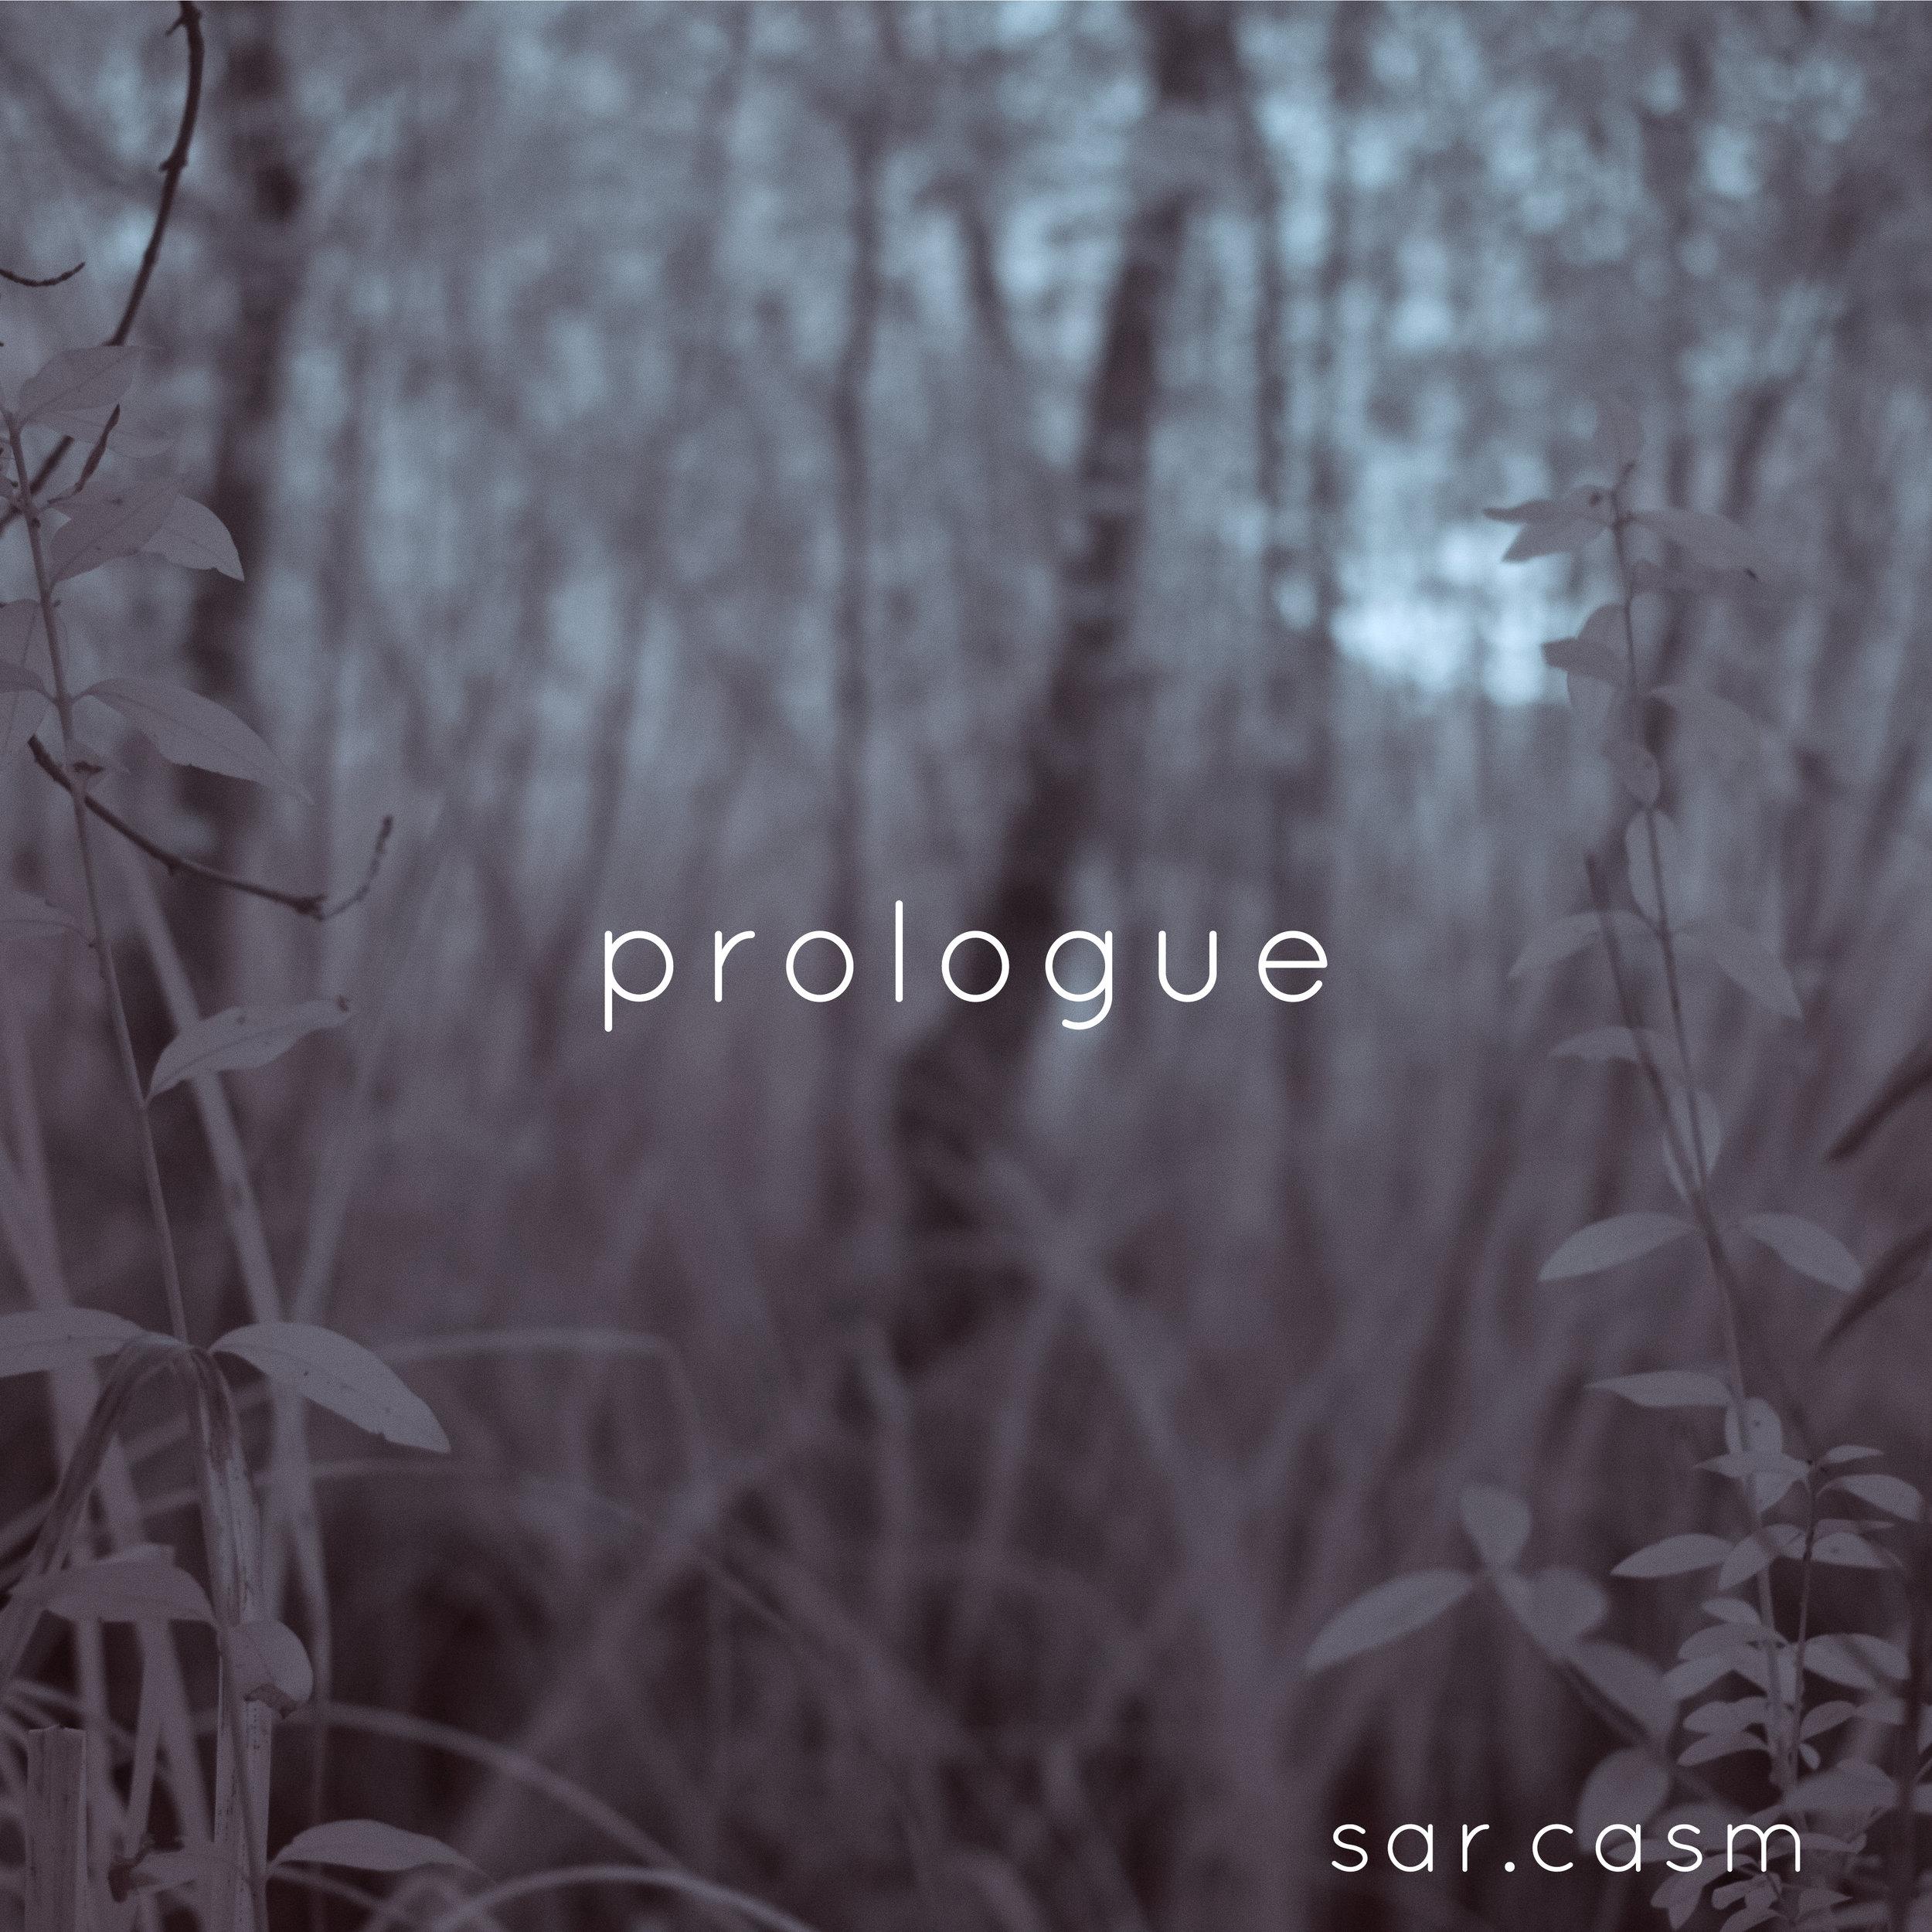 prologue-sarcasm-infrared-photography-nature-foliage-album-art.jpg